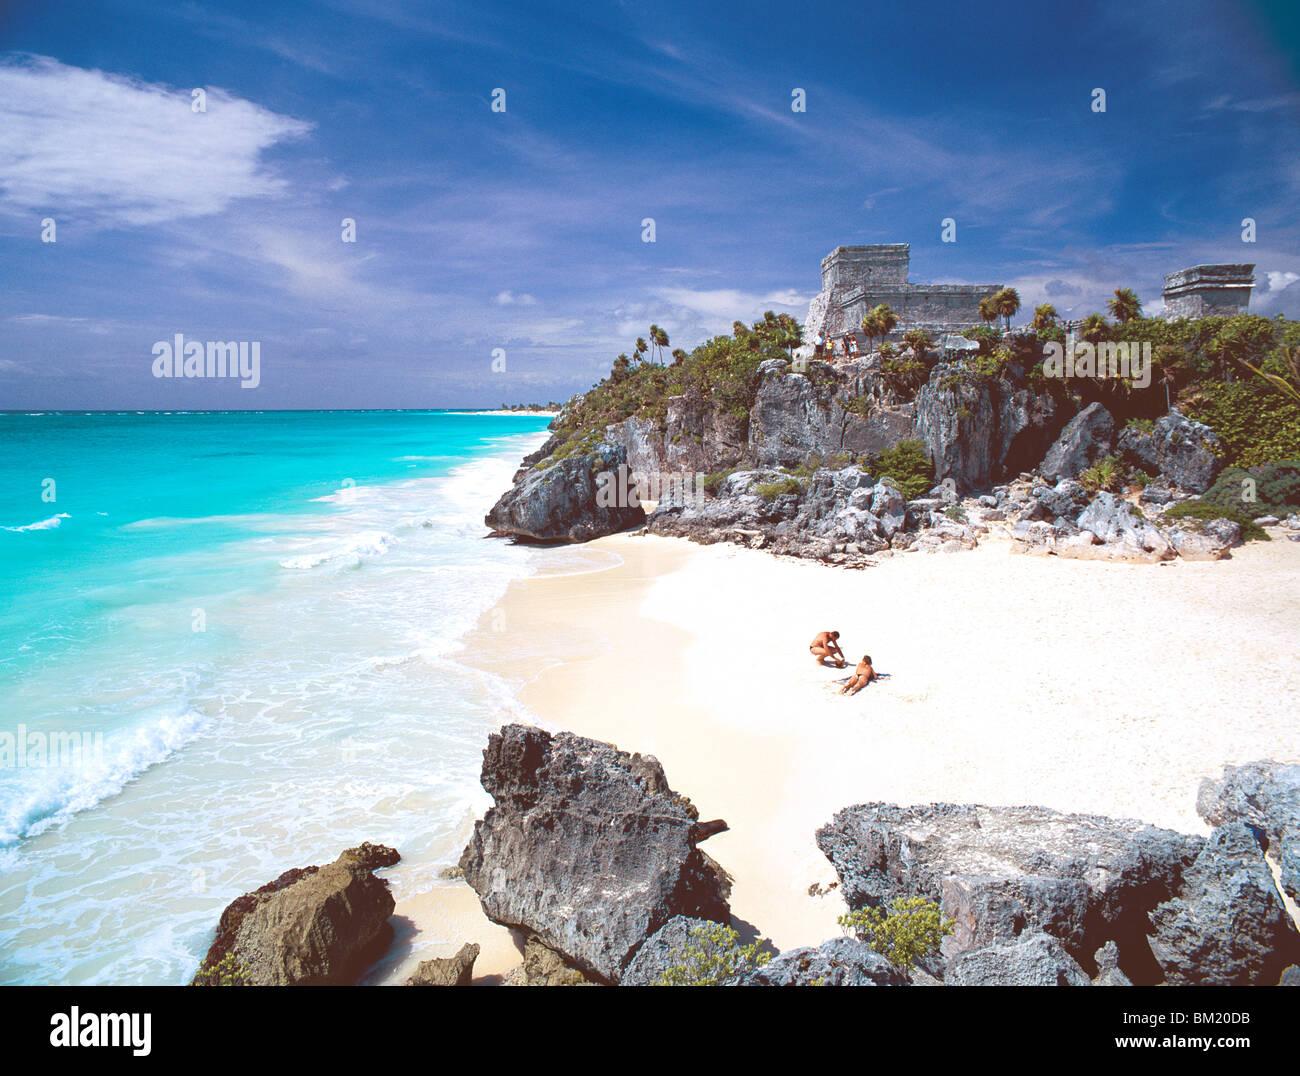 Mayan ruins overlooking the Caribbean Sea and beach at Tulum, Quintana Roo State, Yucatan Peninsula, Mexico, North - Stock Image